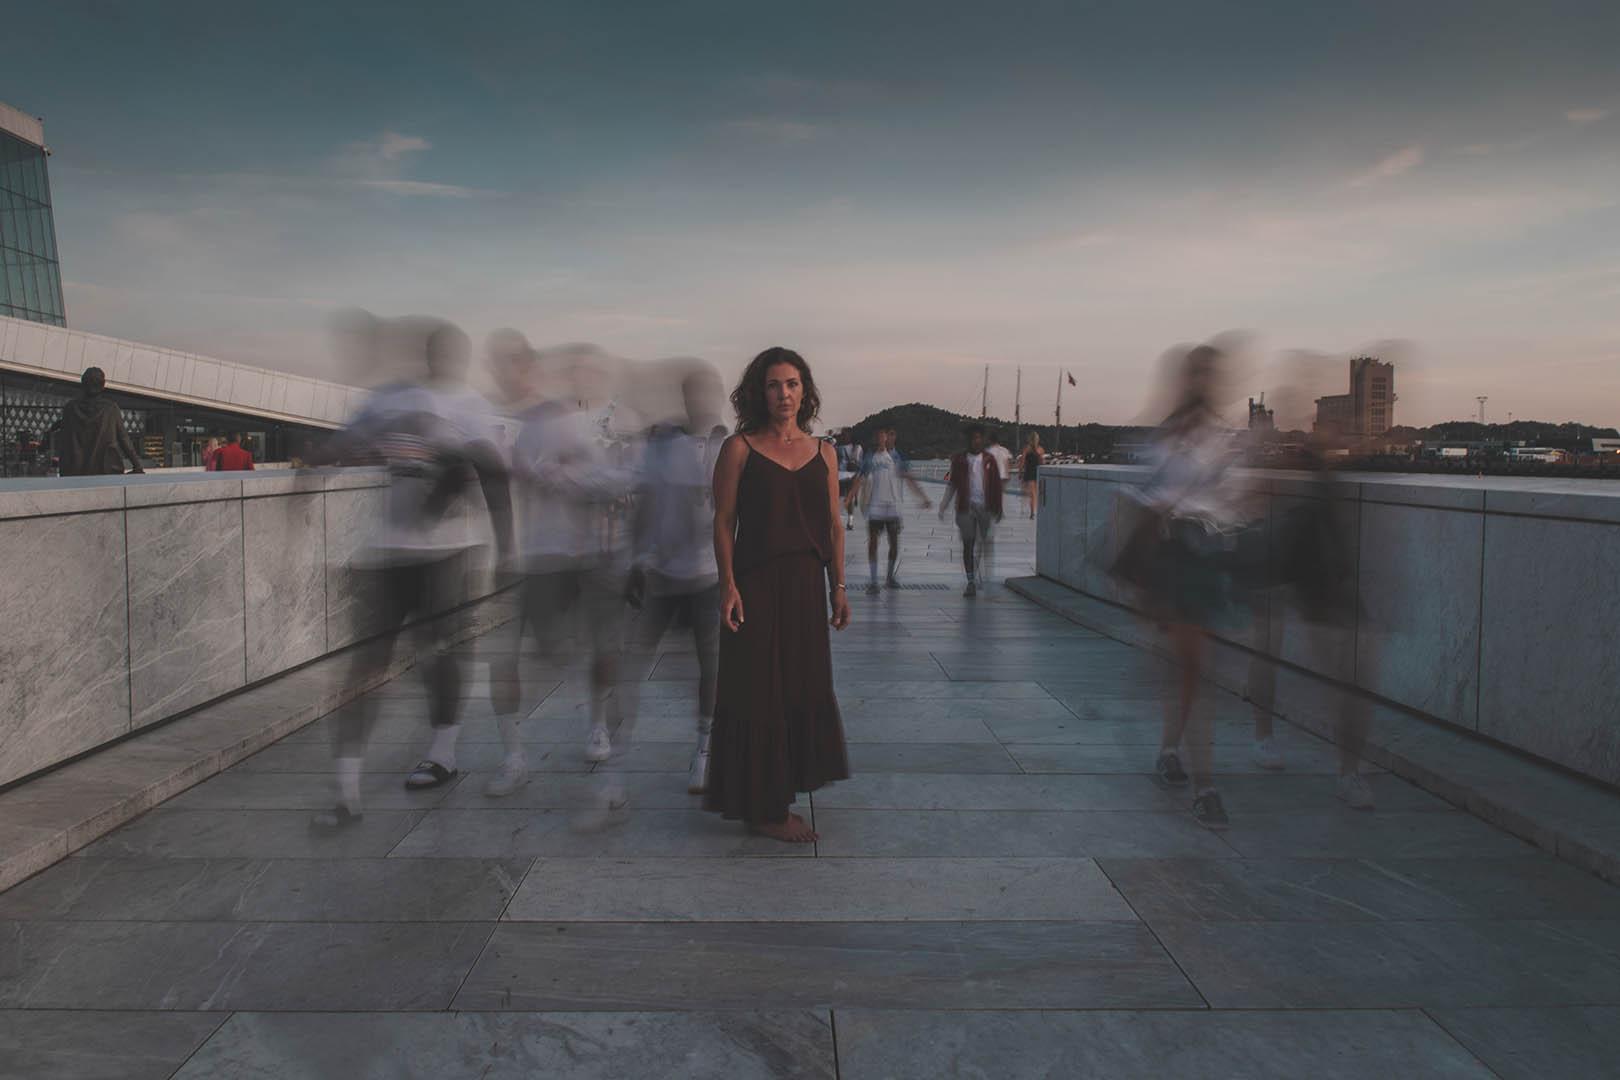 Anna Bülow, In pursuit of veracity, photo by Tor Erik Sagvolden